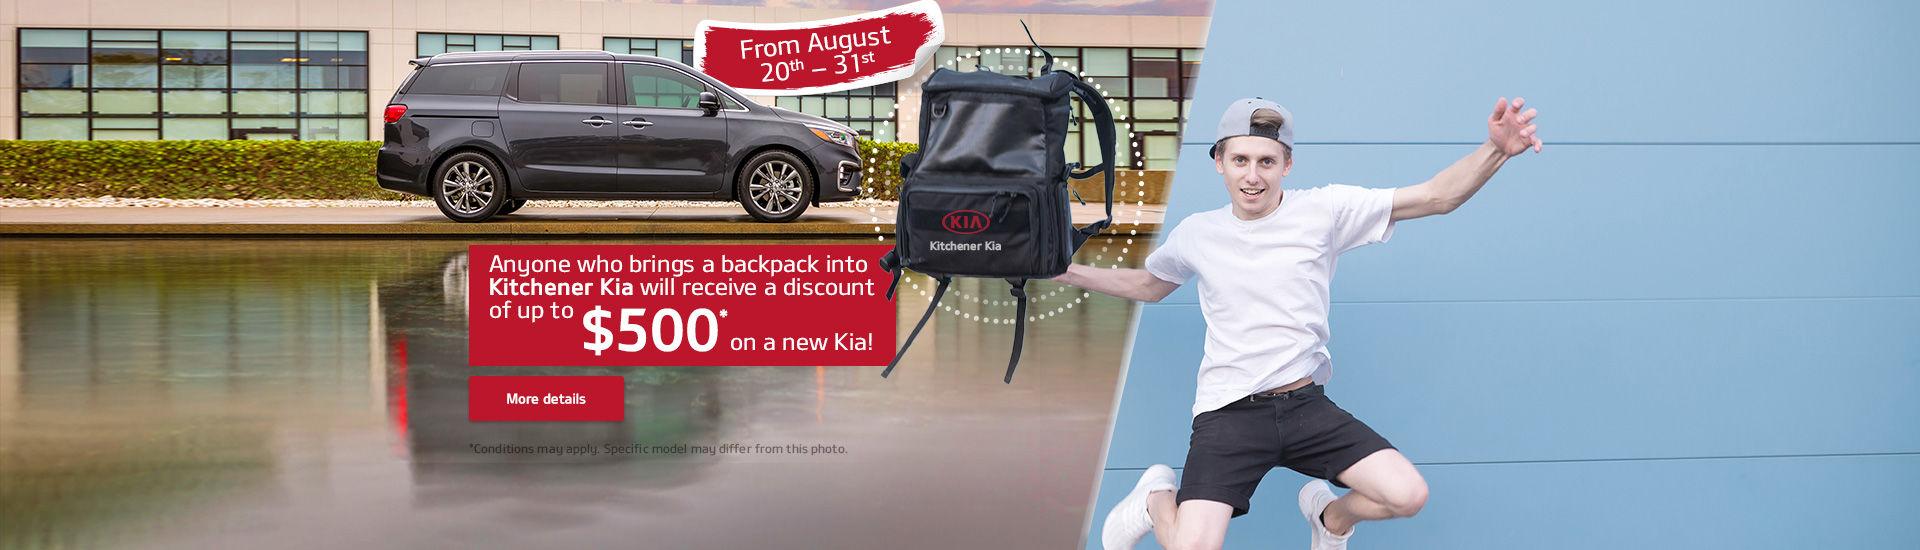 Donate a Backpack - Stuff a Sedona!